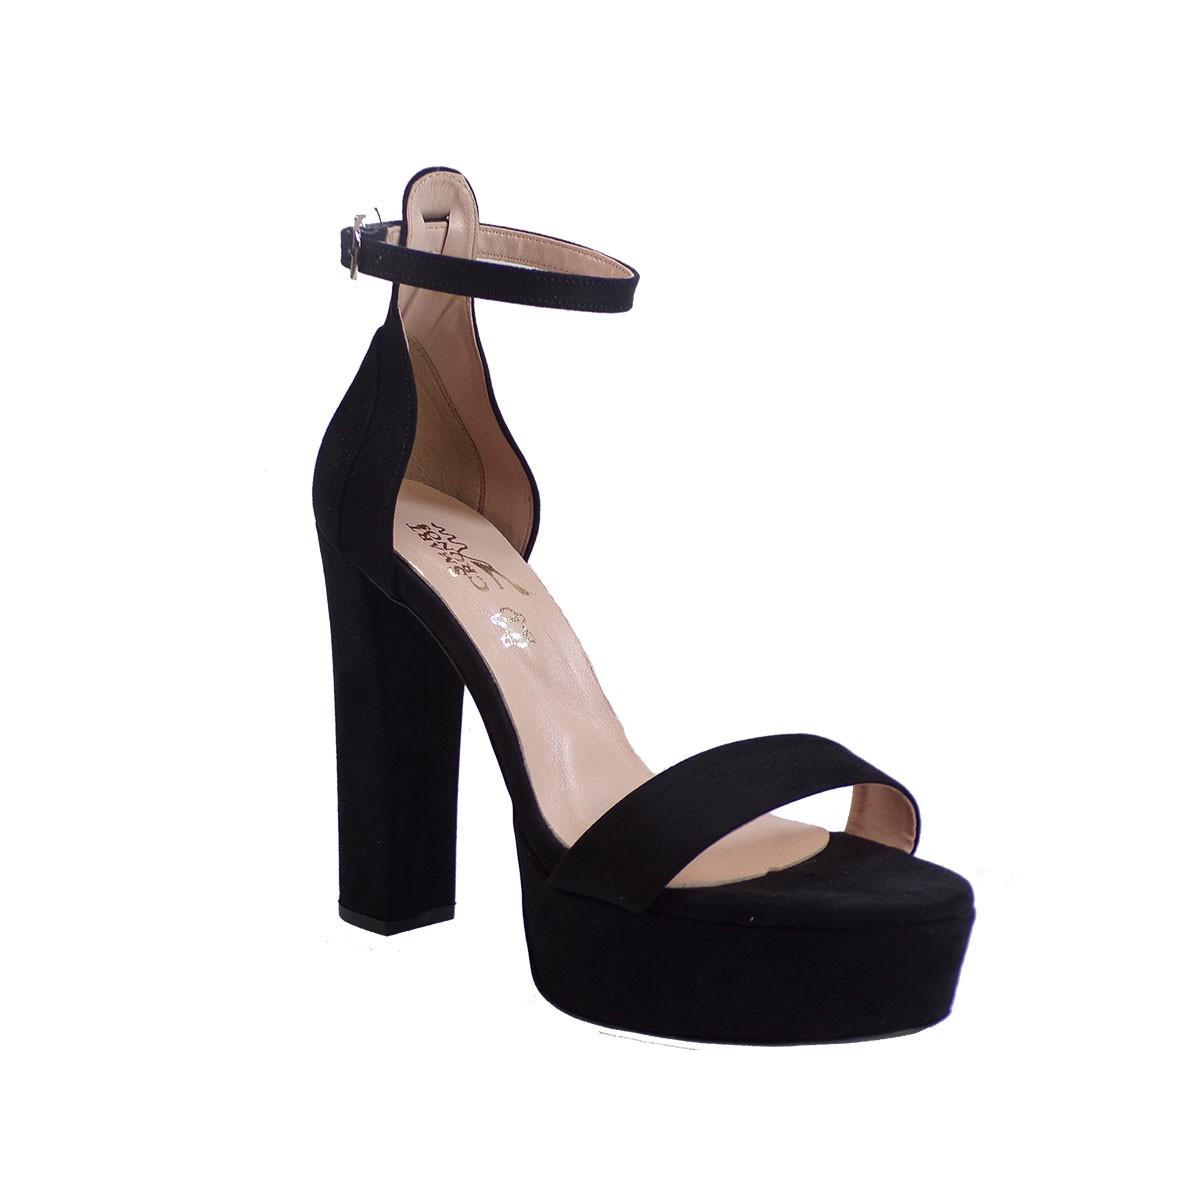 Smart Cronos Γυναικεία Παπούτσια Πέδιλα 6816-3597 Μαύρο Καστόρι -Δέρμα